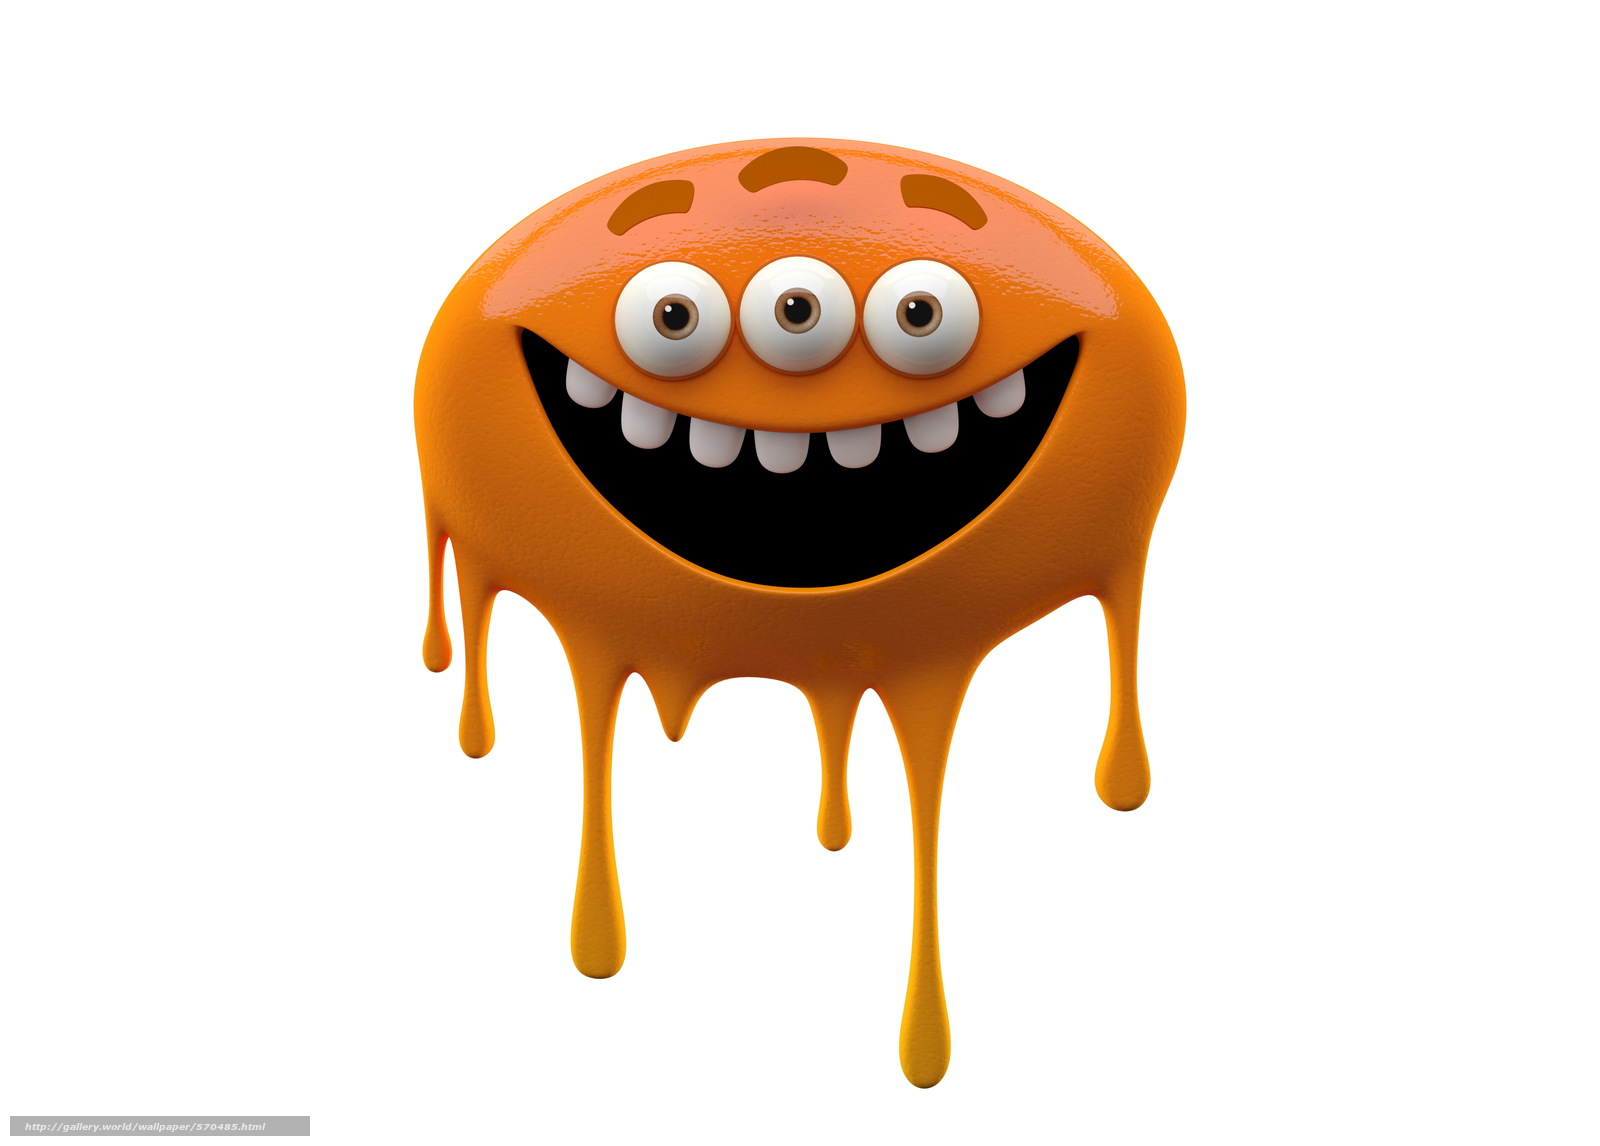 Download wallpaper bright smiling monster on white background,  orange monster slug,  joy free desktop wallpaper in the resolution 6282x4500 — picture №570485